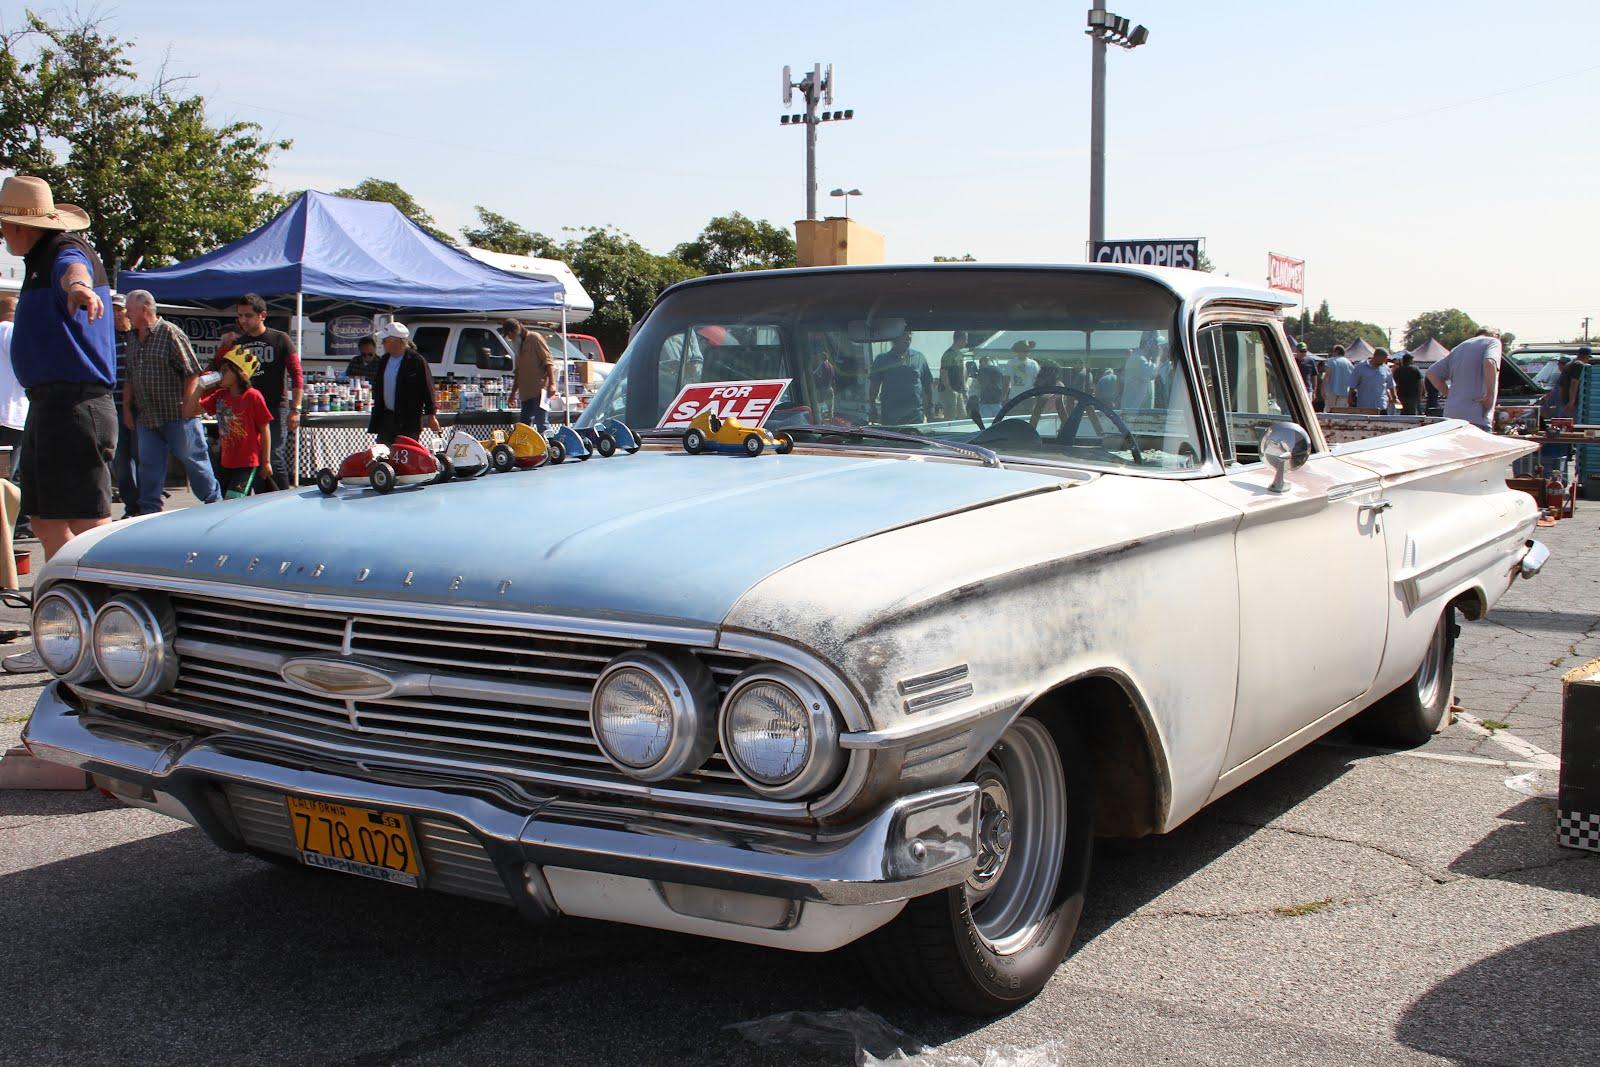 Craigslist 1960 El Camino For Sale Autos Post